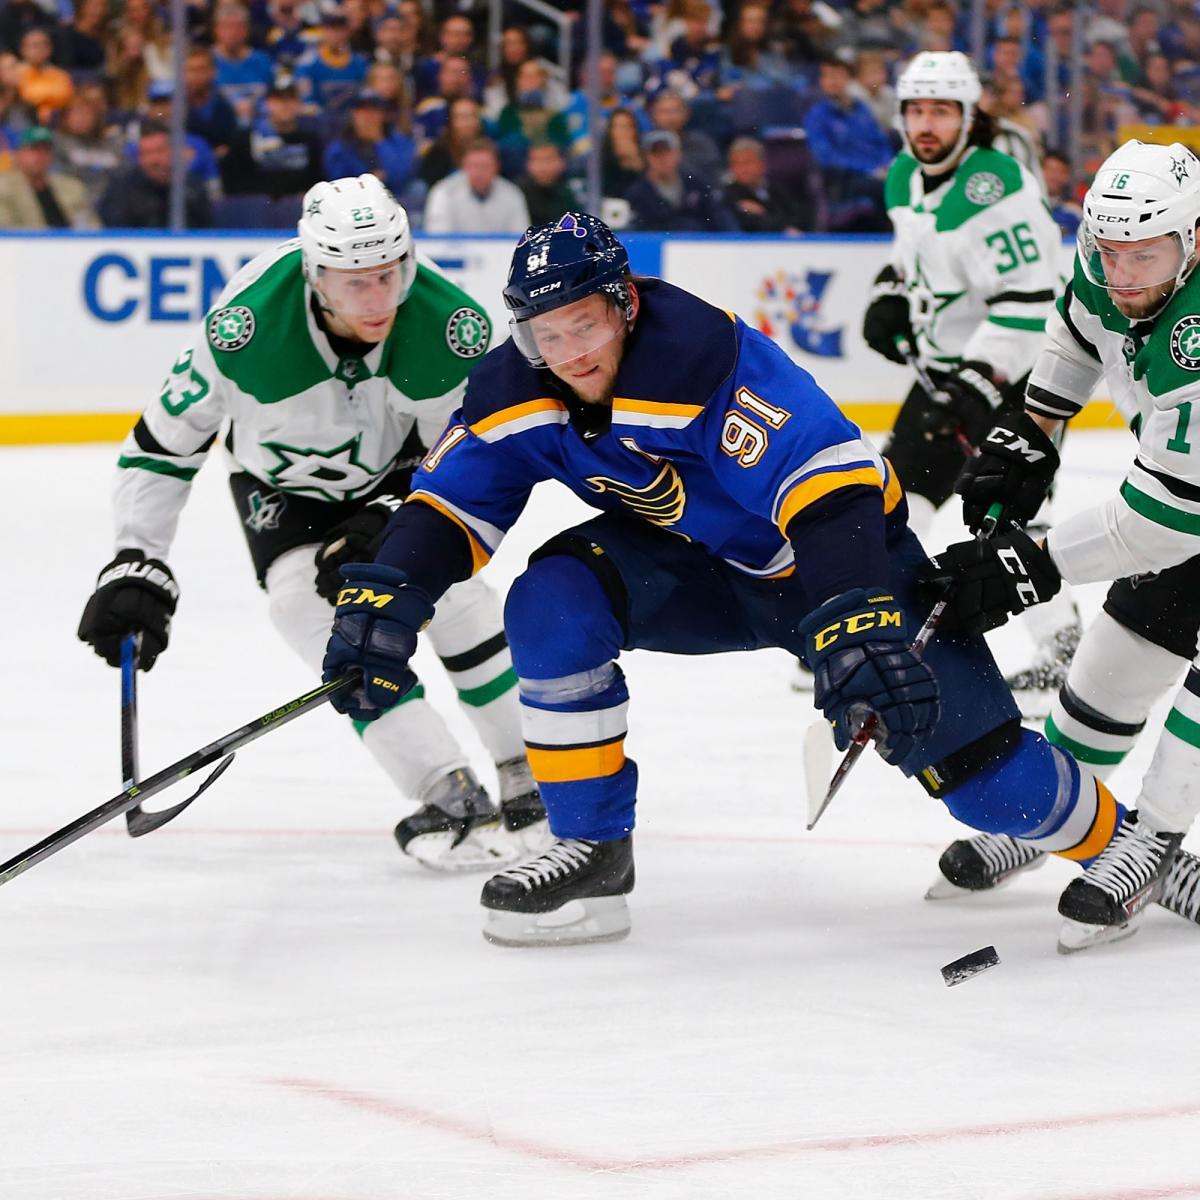 NHL Playoff Bracket 2019: TV Start Times, Live-Stream